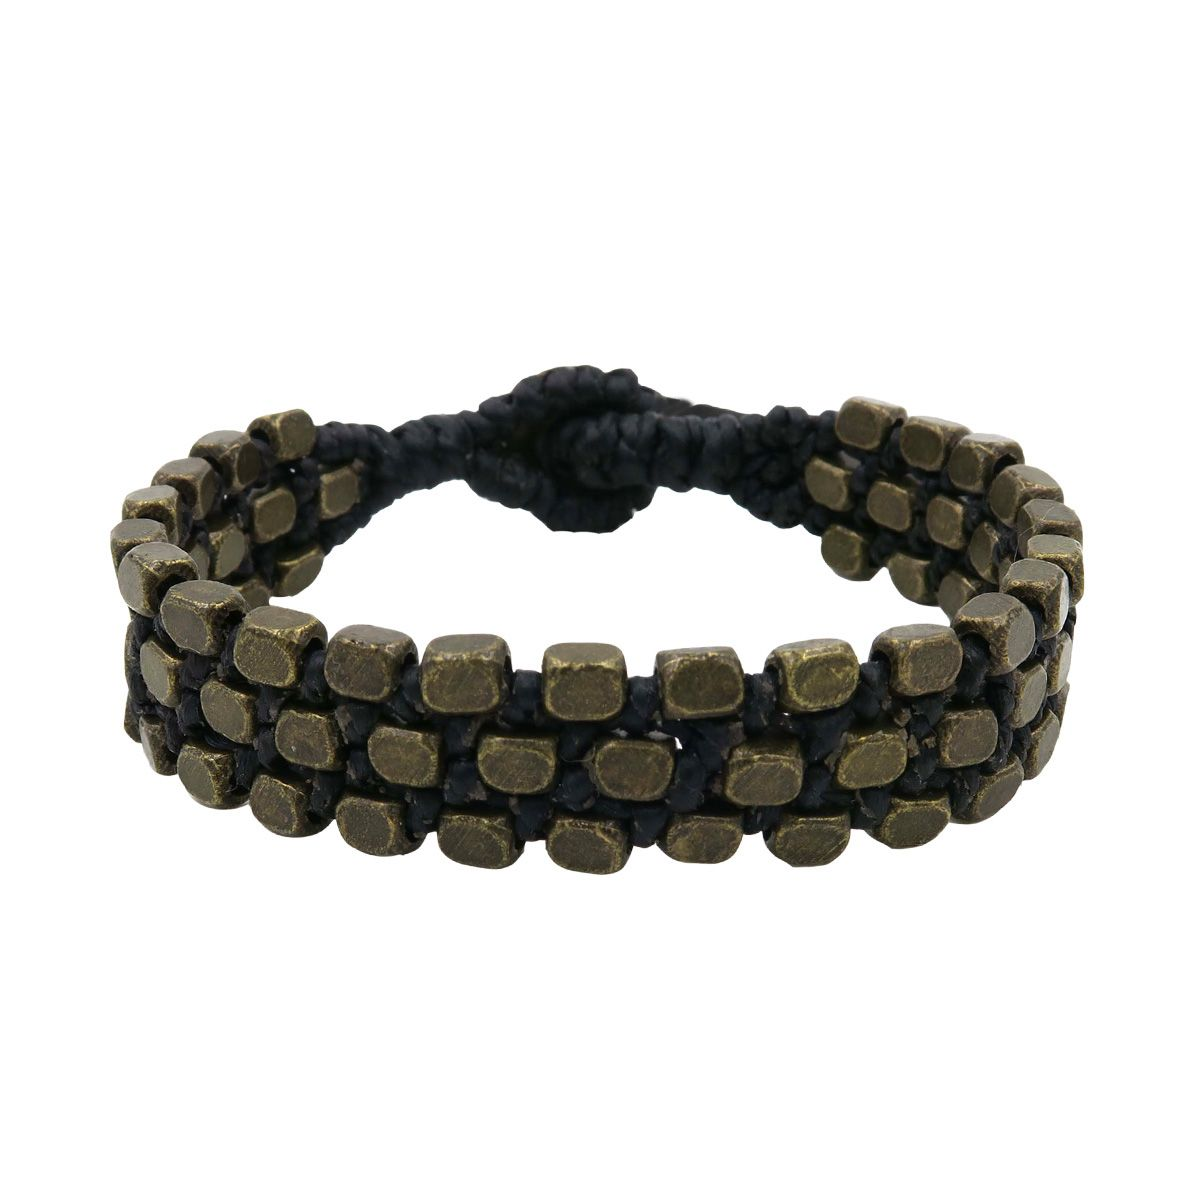 Boho Jewelry Designs Magica Bali